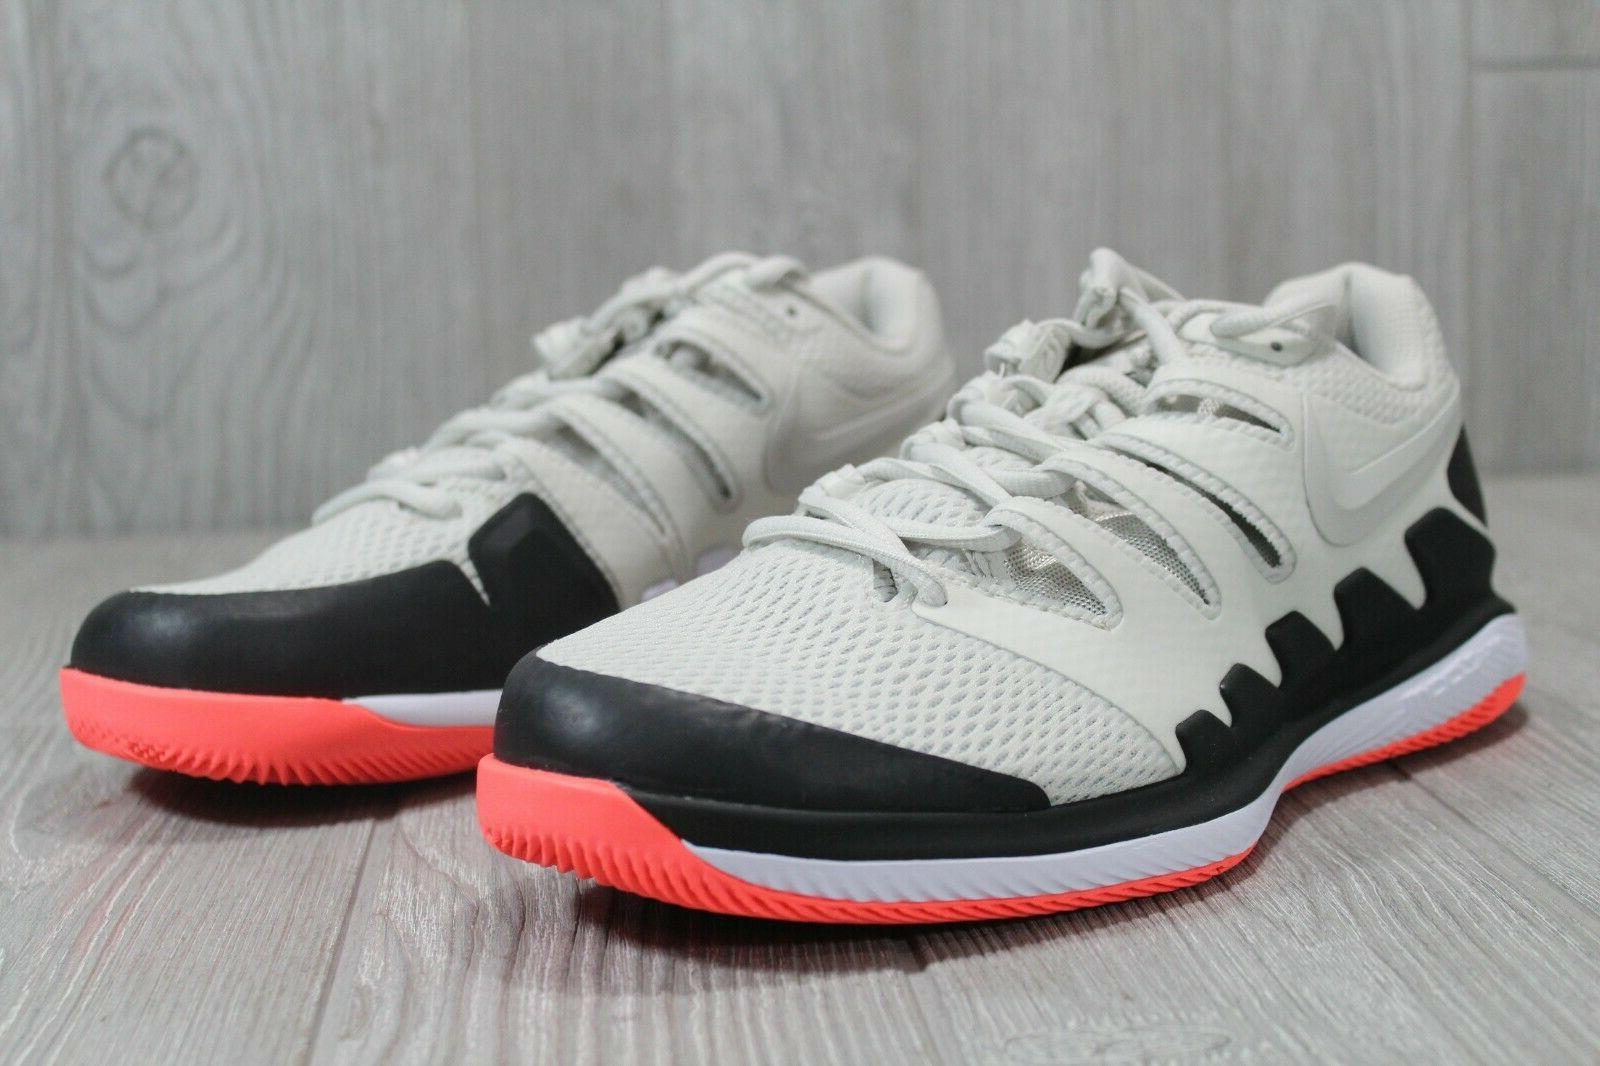 50 Nike Zoom Black Tennis Shoes 007 Size